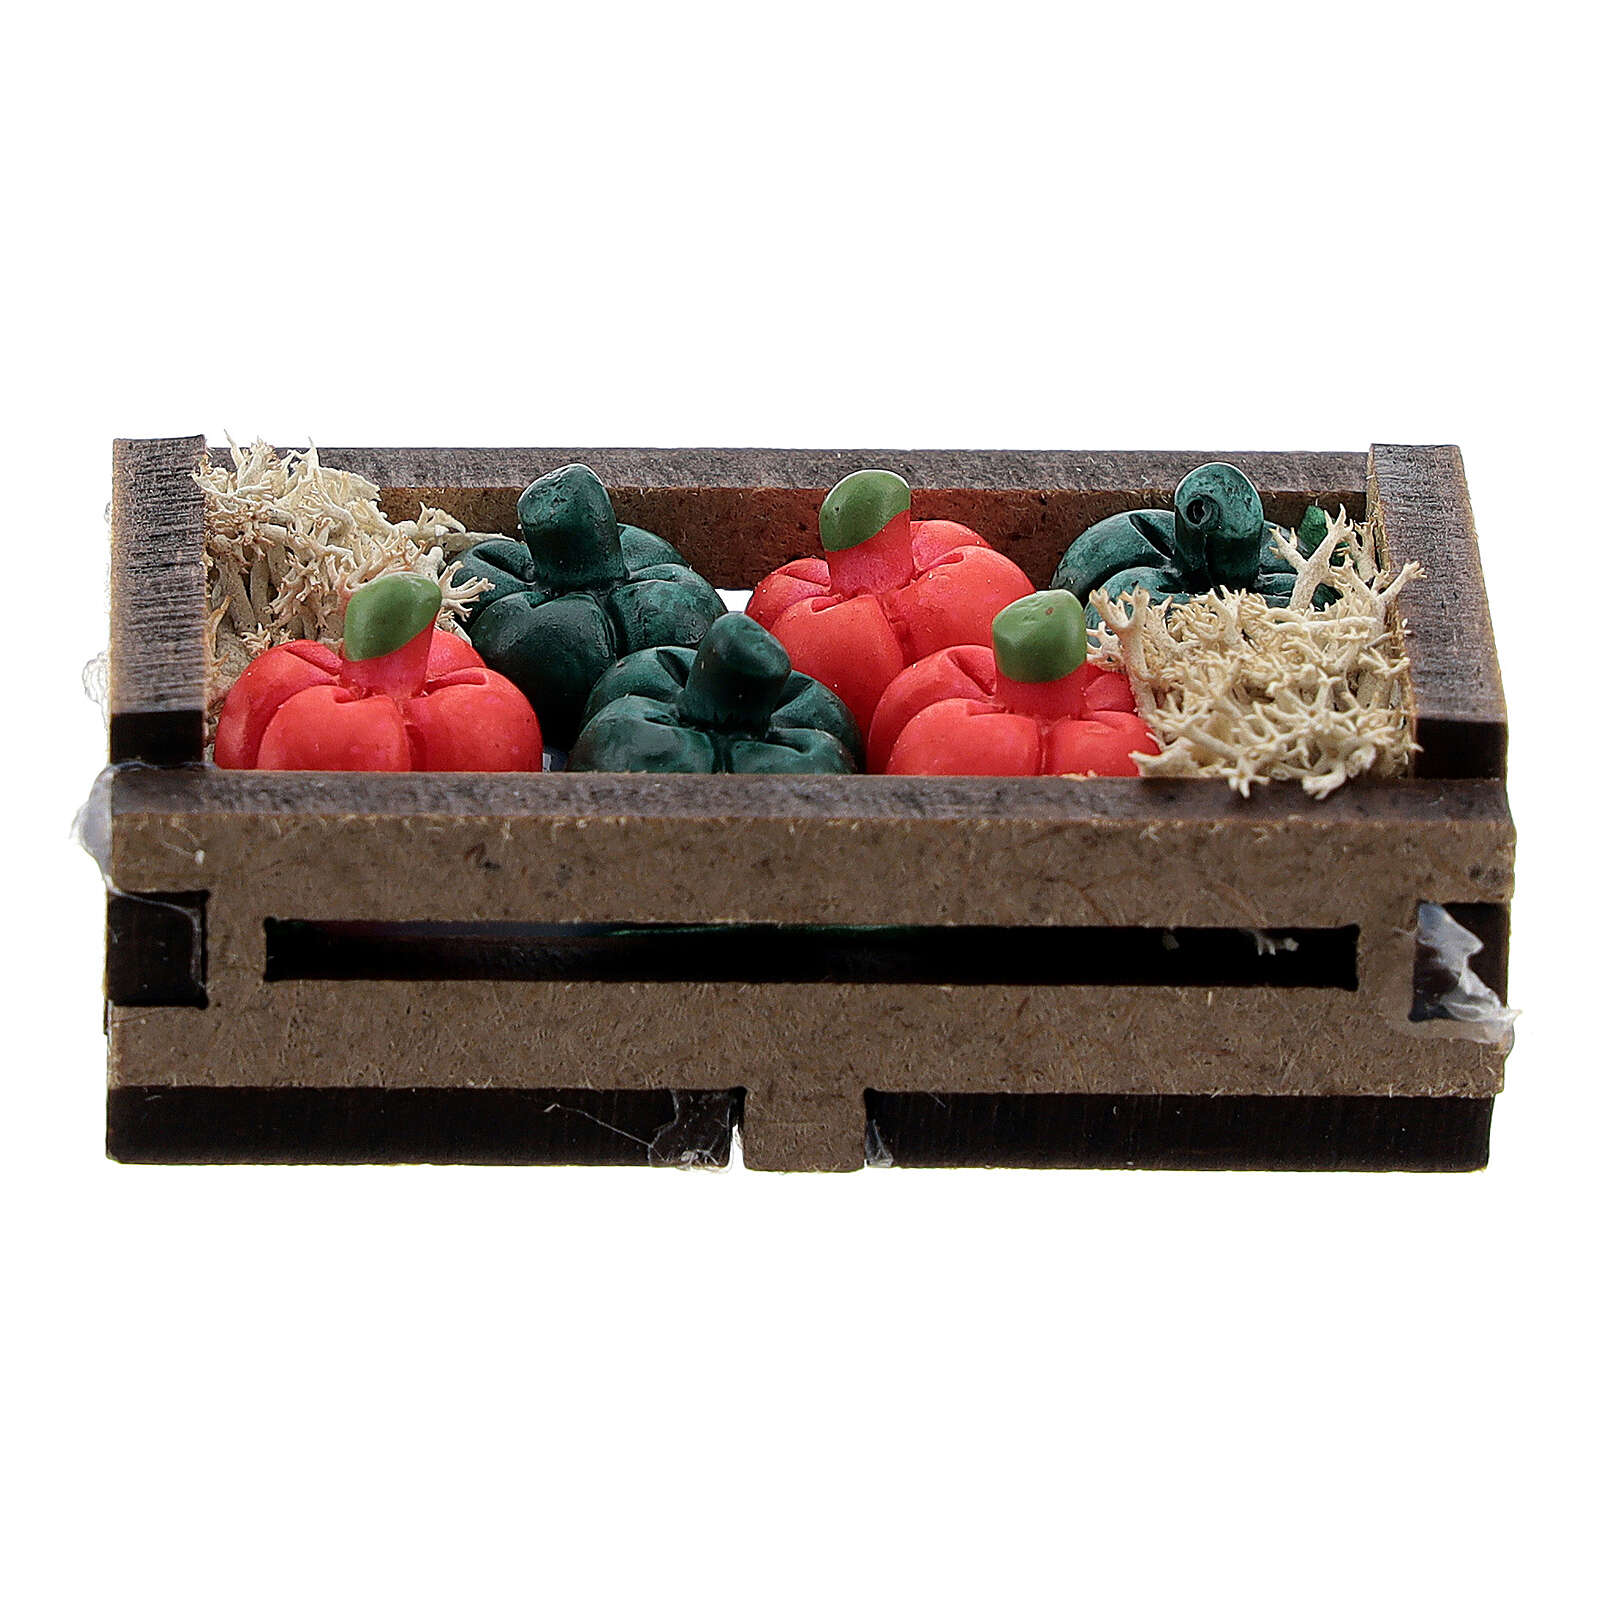 Peperoni resina in cassetta presepe 10-12 cm 4